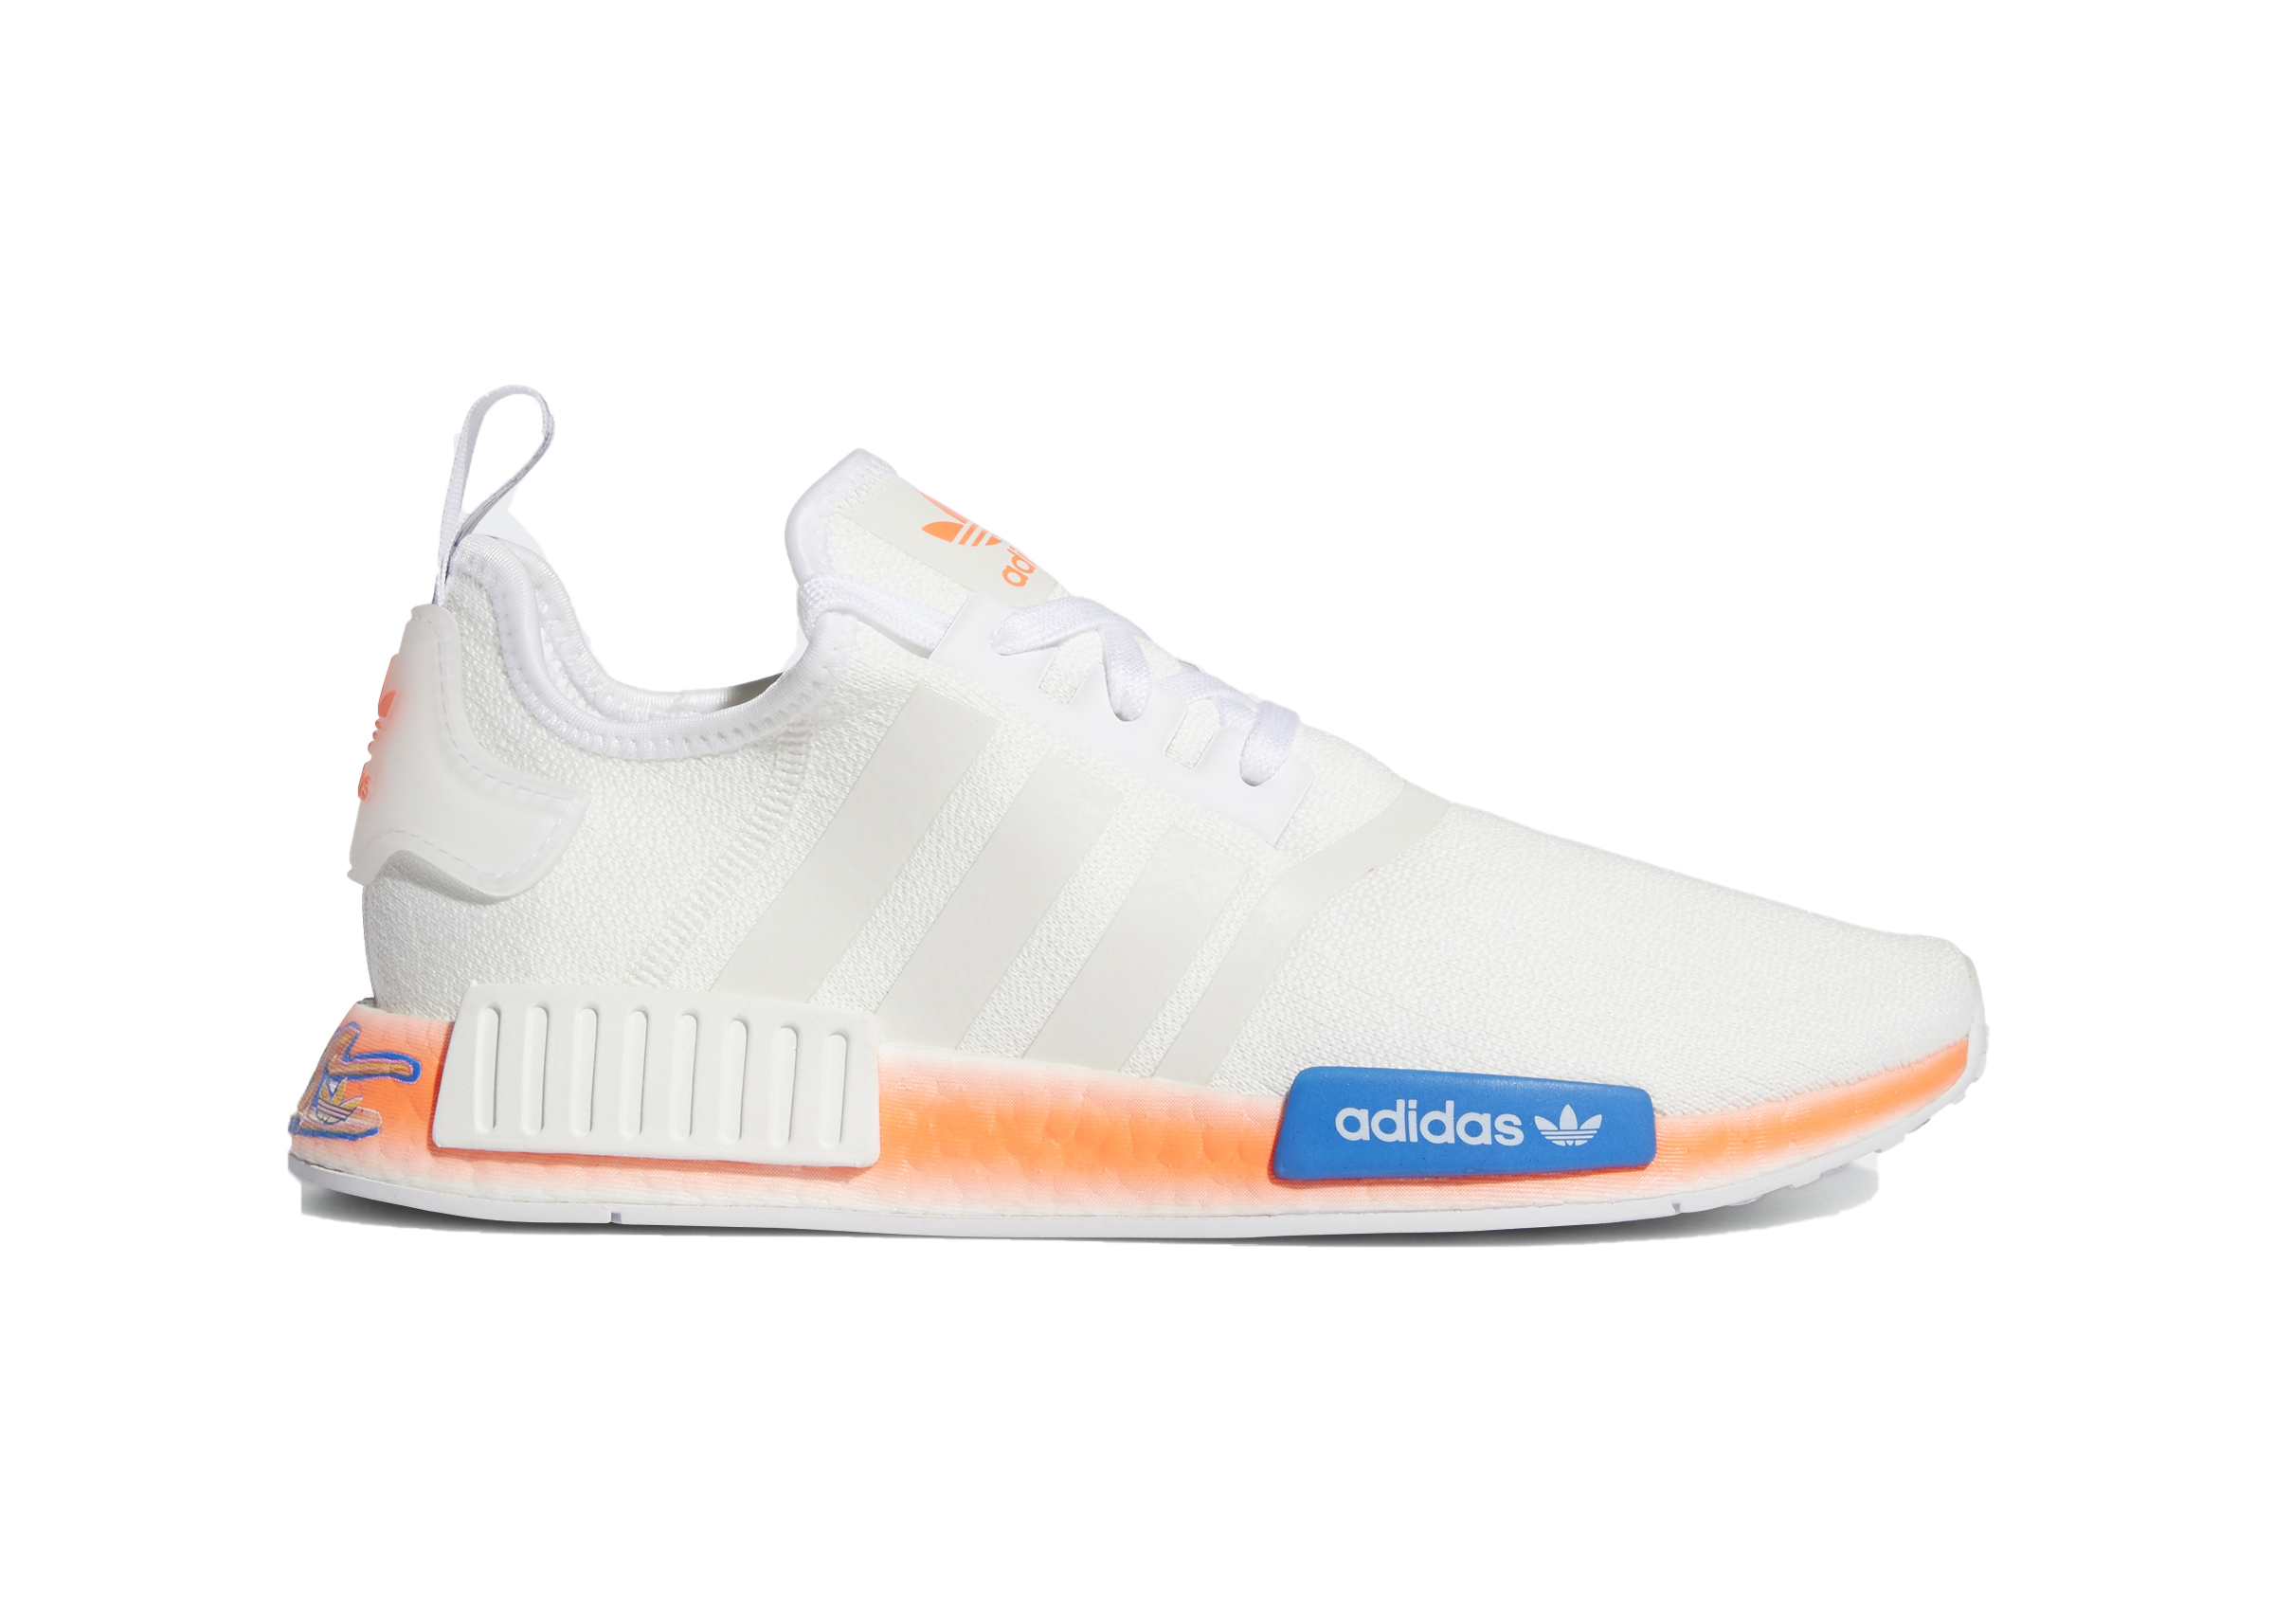 adidas NMD_R1 Cloud White Orange - FV7852